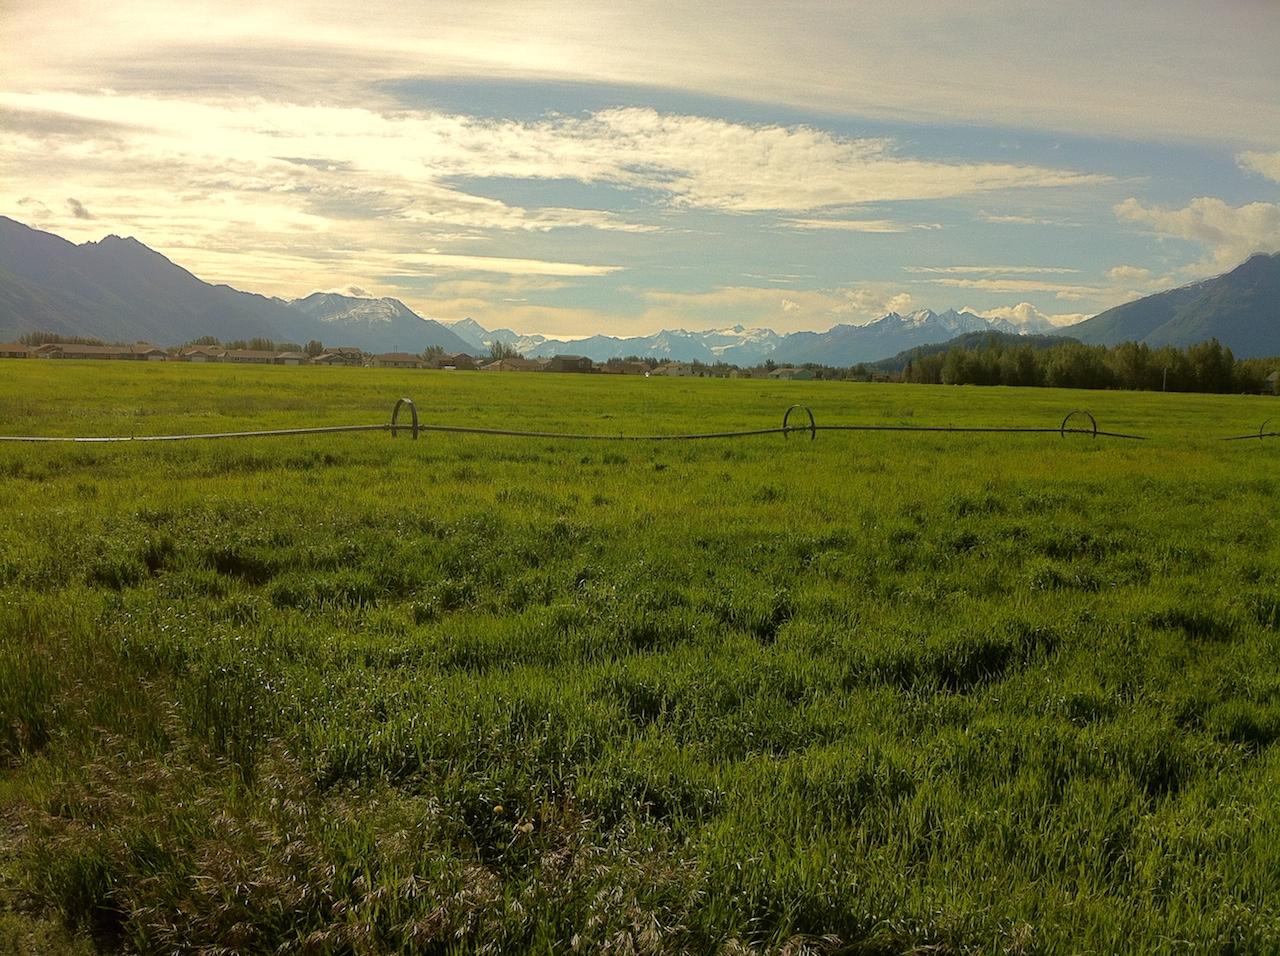 The Alaska Farmland Trust saving farmland in the Matanuska Valley, protected a 40 acre hayfield near downtown Palmer, Ak